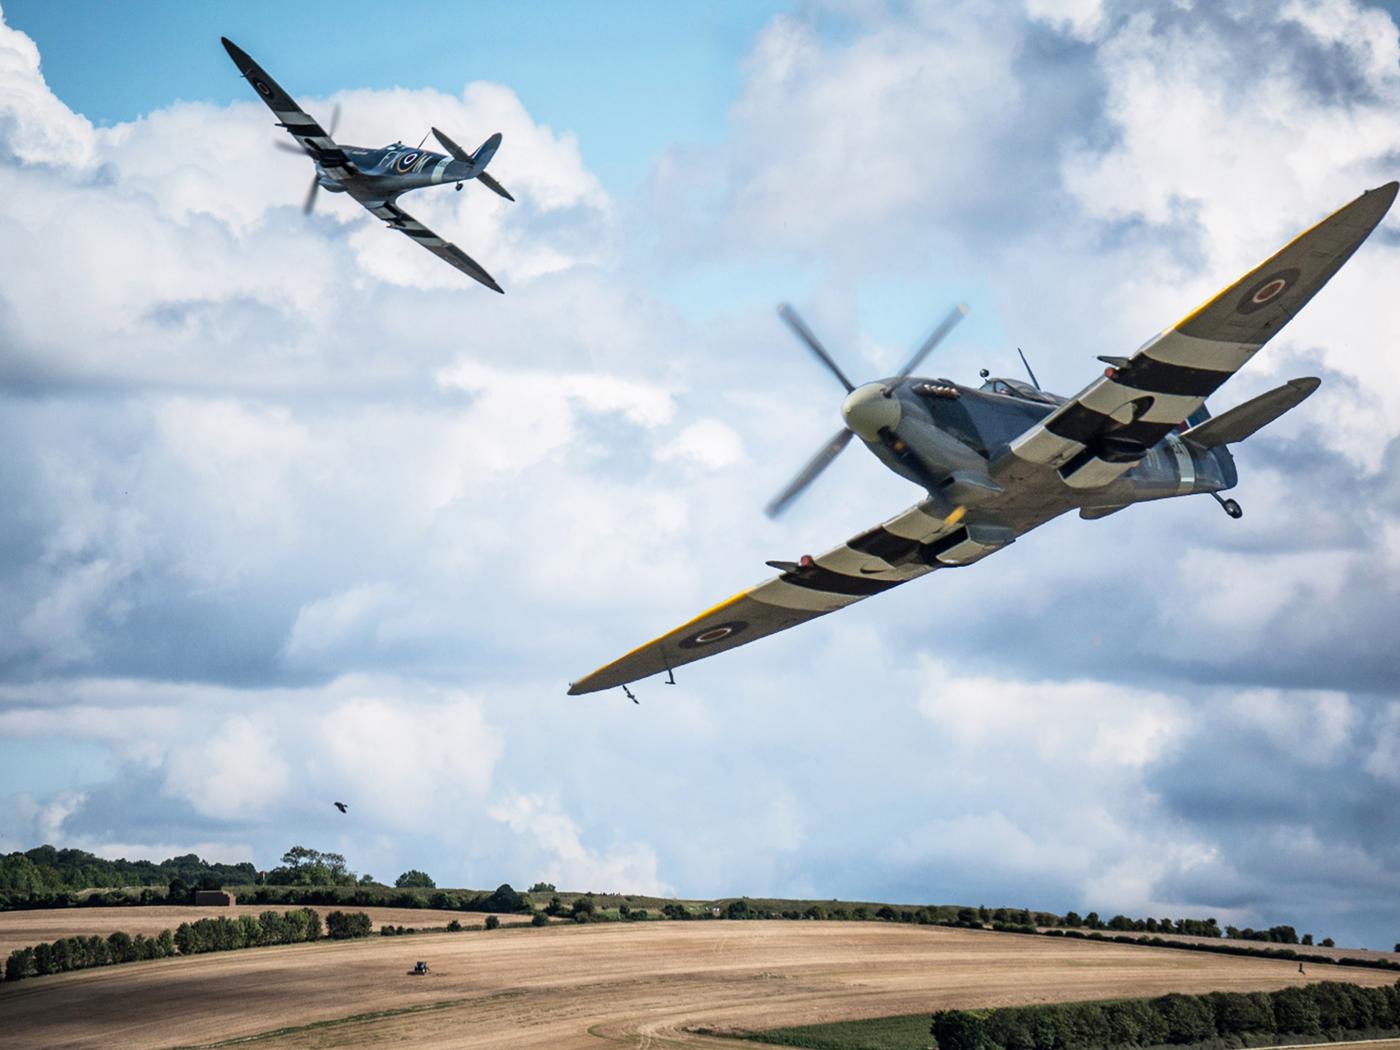 'Spitfire patrol' by Ian Porter